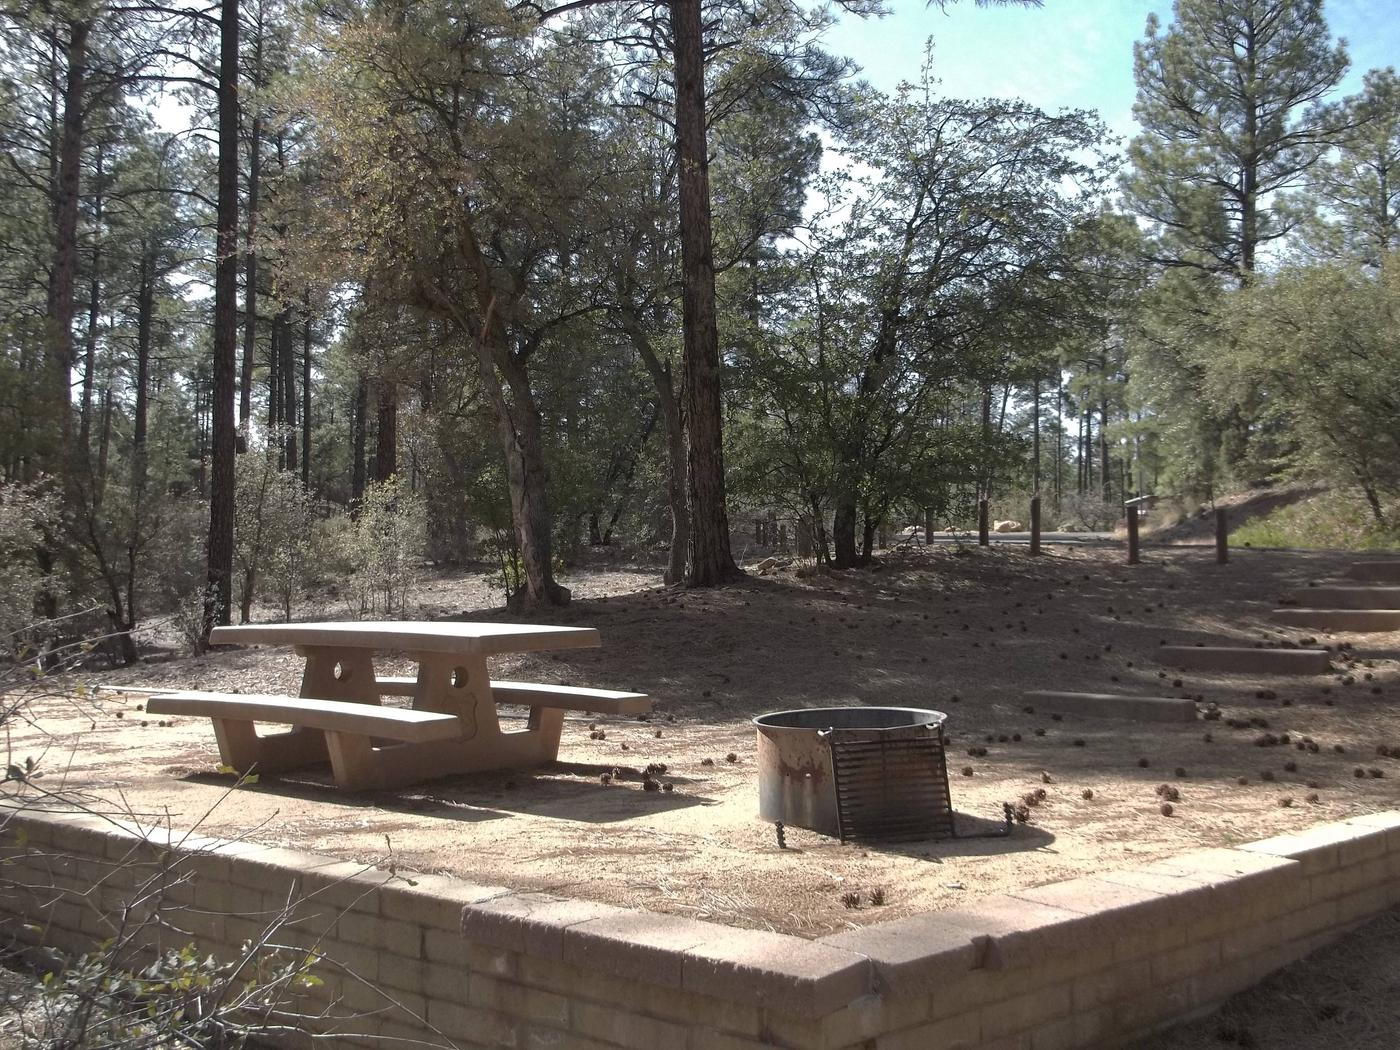 Hilltop Campground Campsite 20